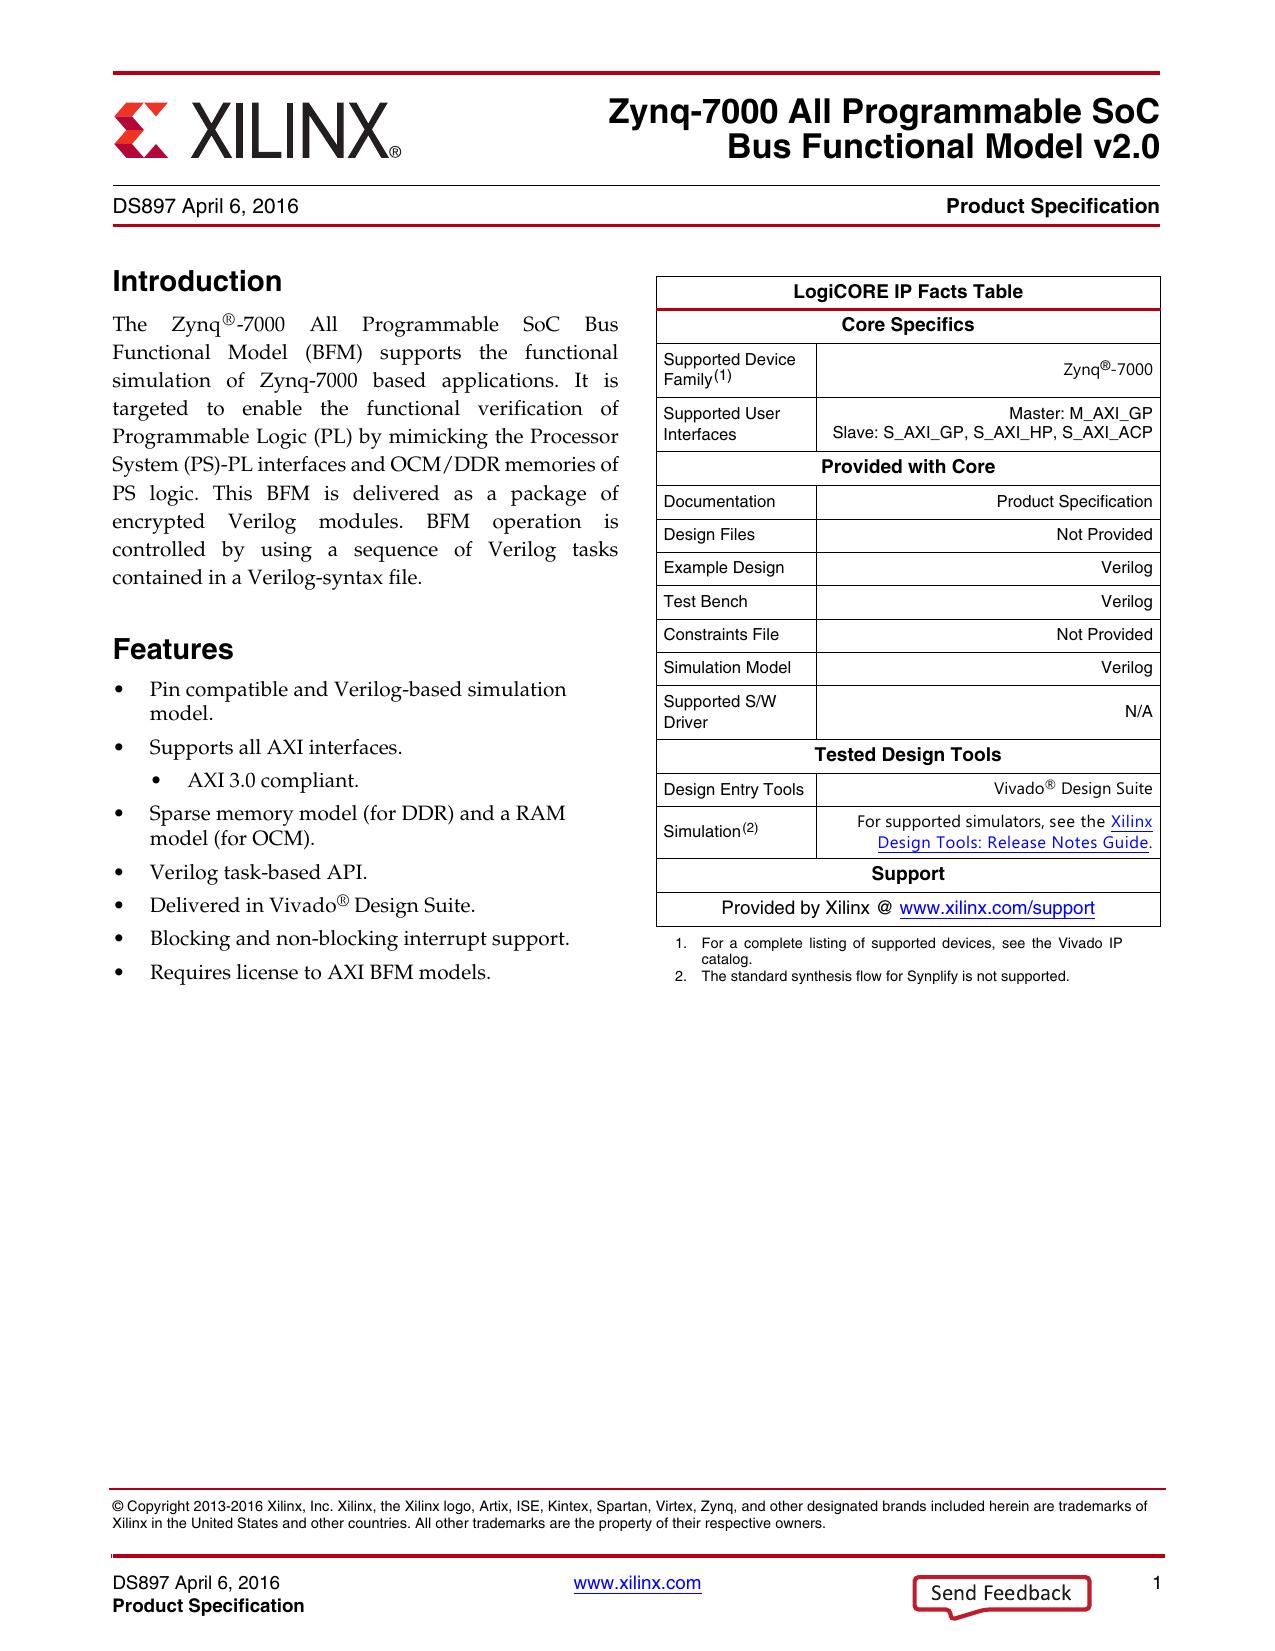 Xilinx DS897 Zynq-7000 Bus Functional Model, Data Sheet v 2 0